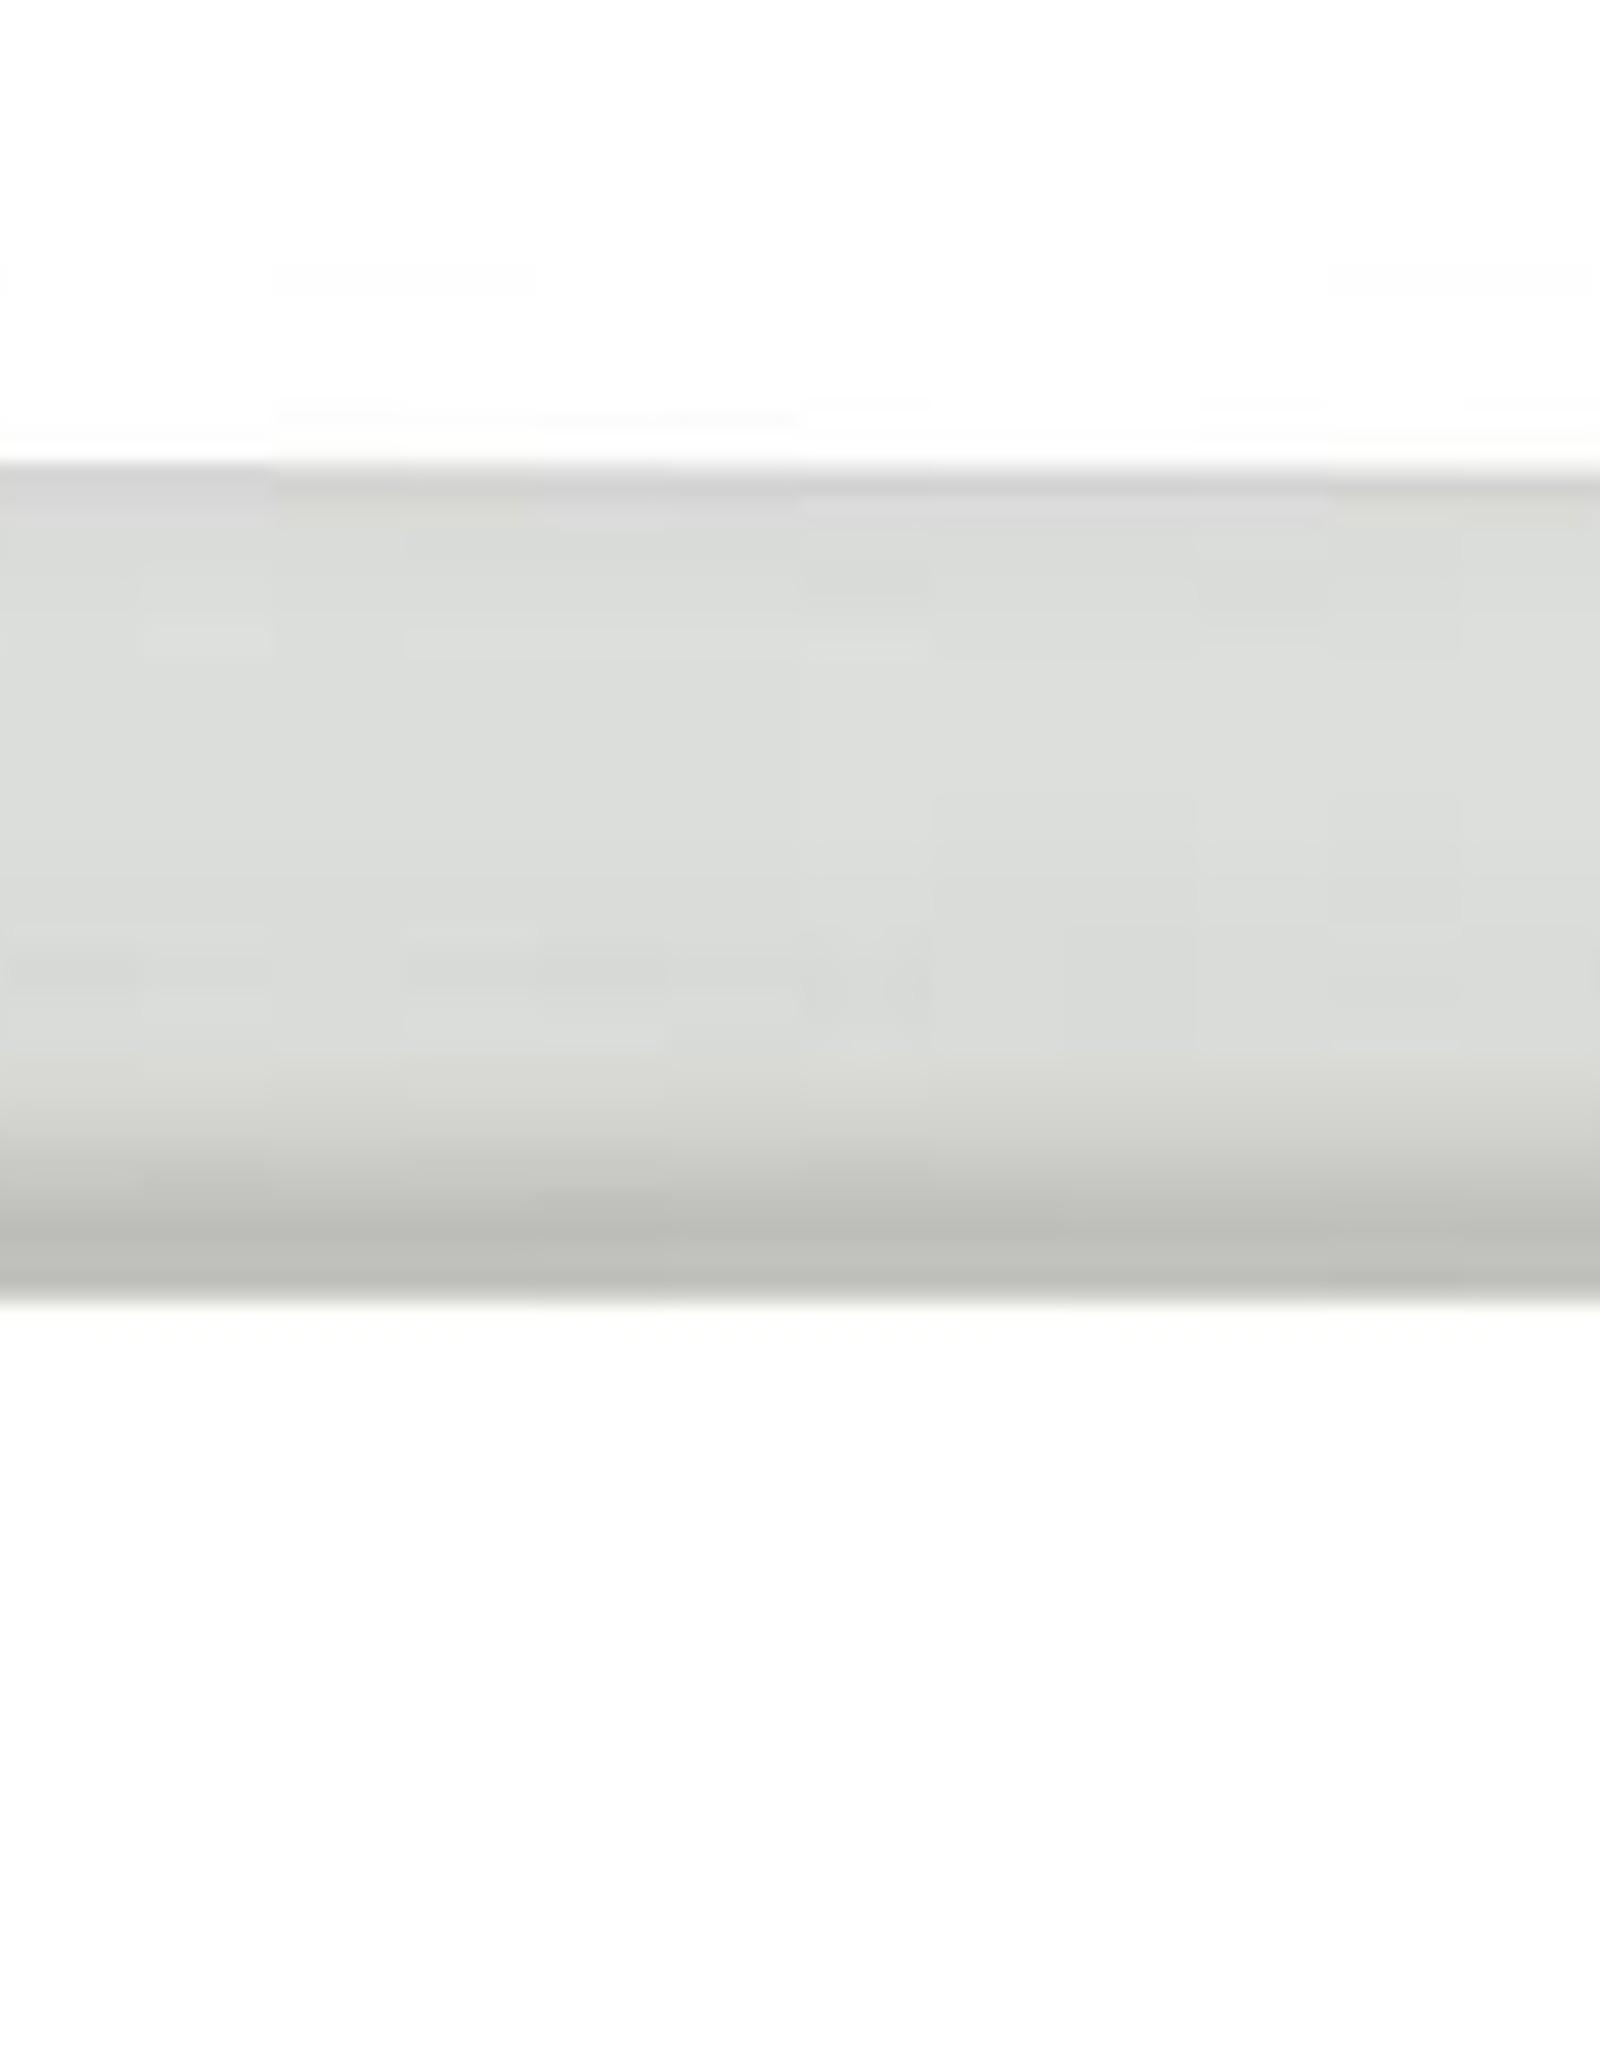 ULTRASUN Ultra Sun Ultra UV 8K T5 HO 54 Watt 4 ft Lamp